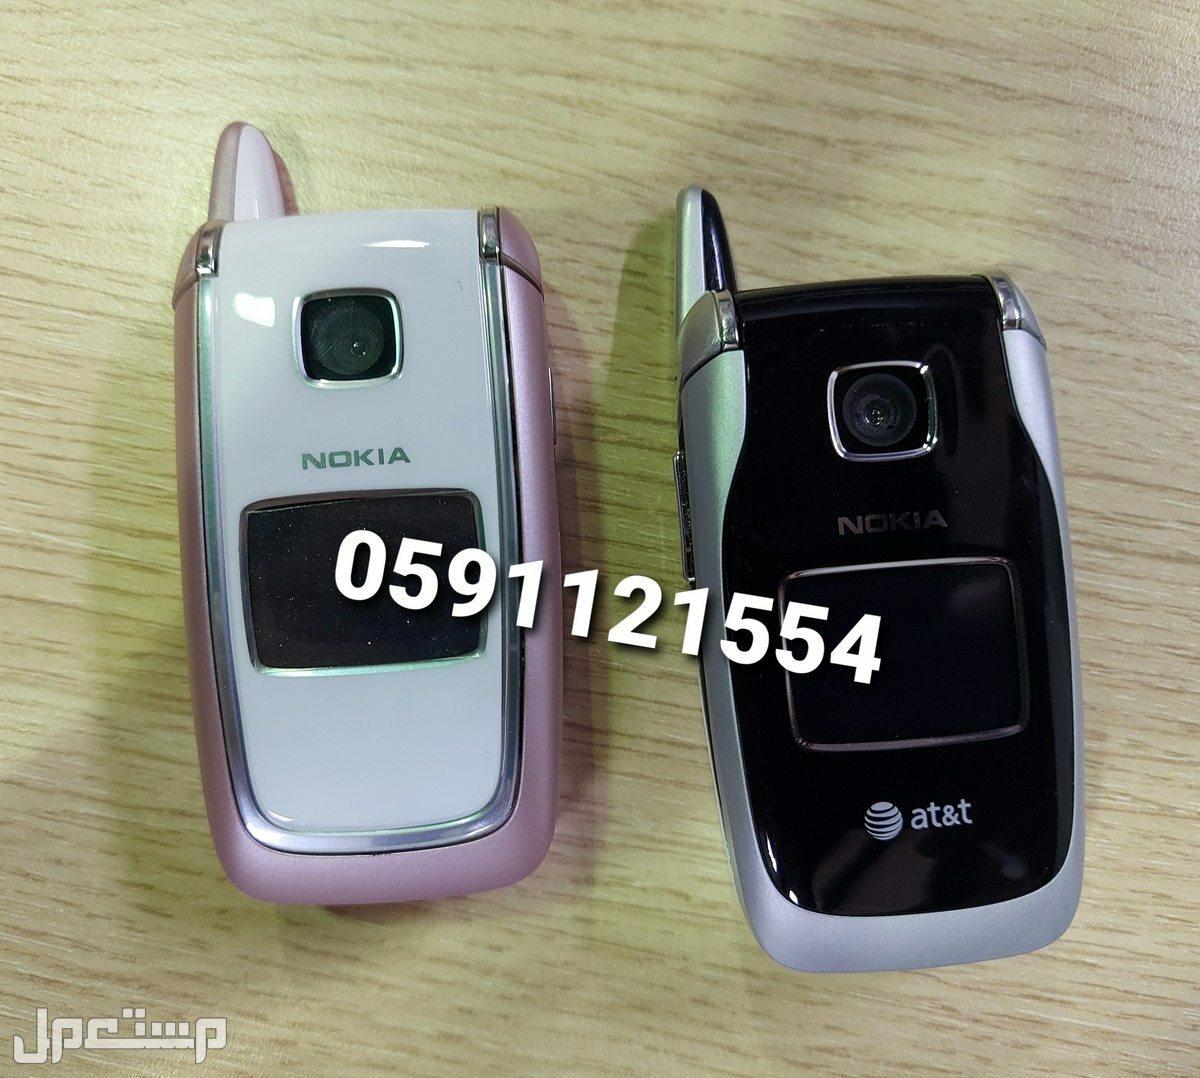 جوال نوكيا Nokia 6101- جوال نوكيا قلاب - جديد